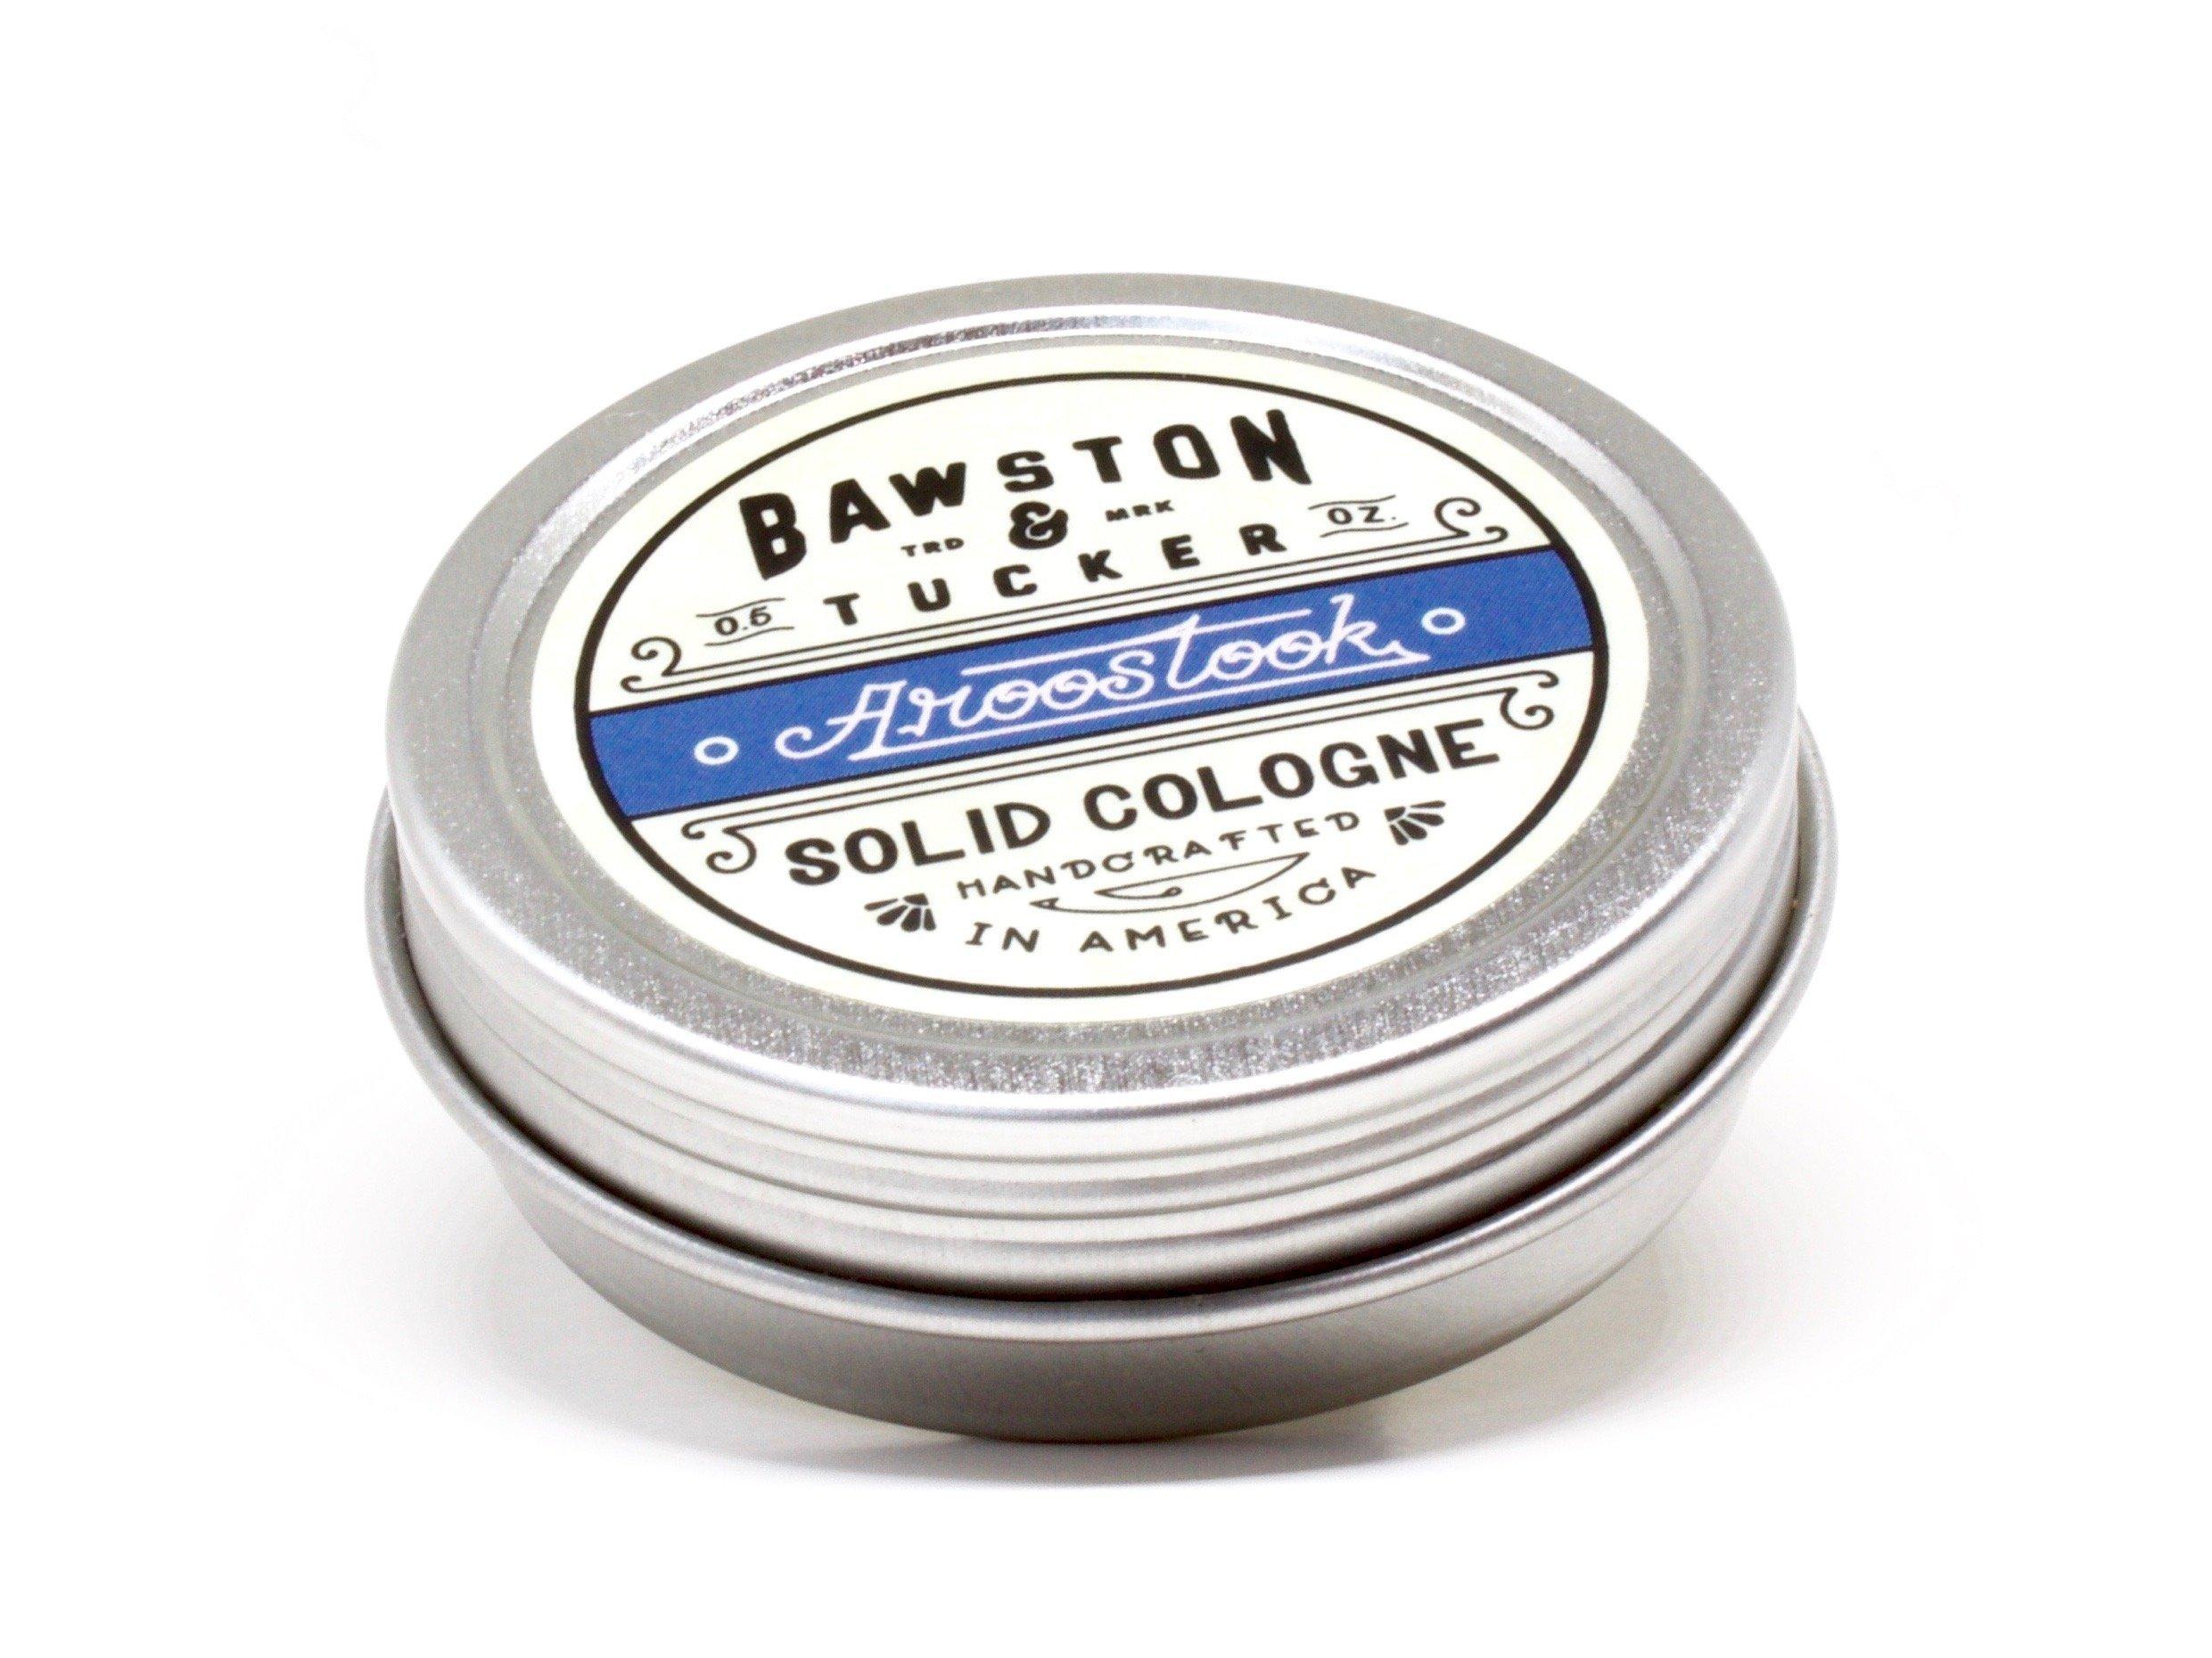 Aroostook Solid Cologne 0.5 oz